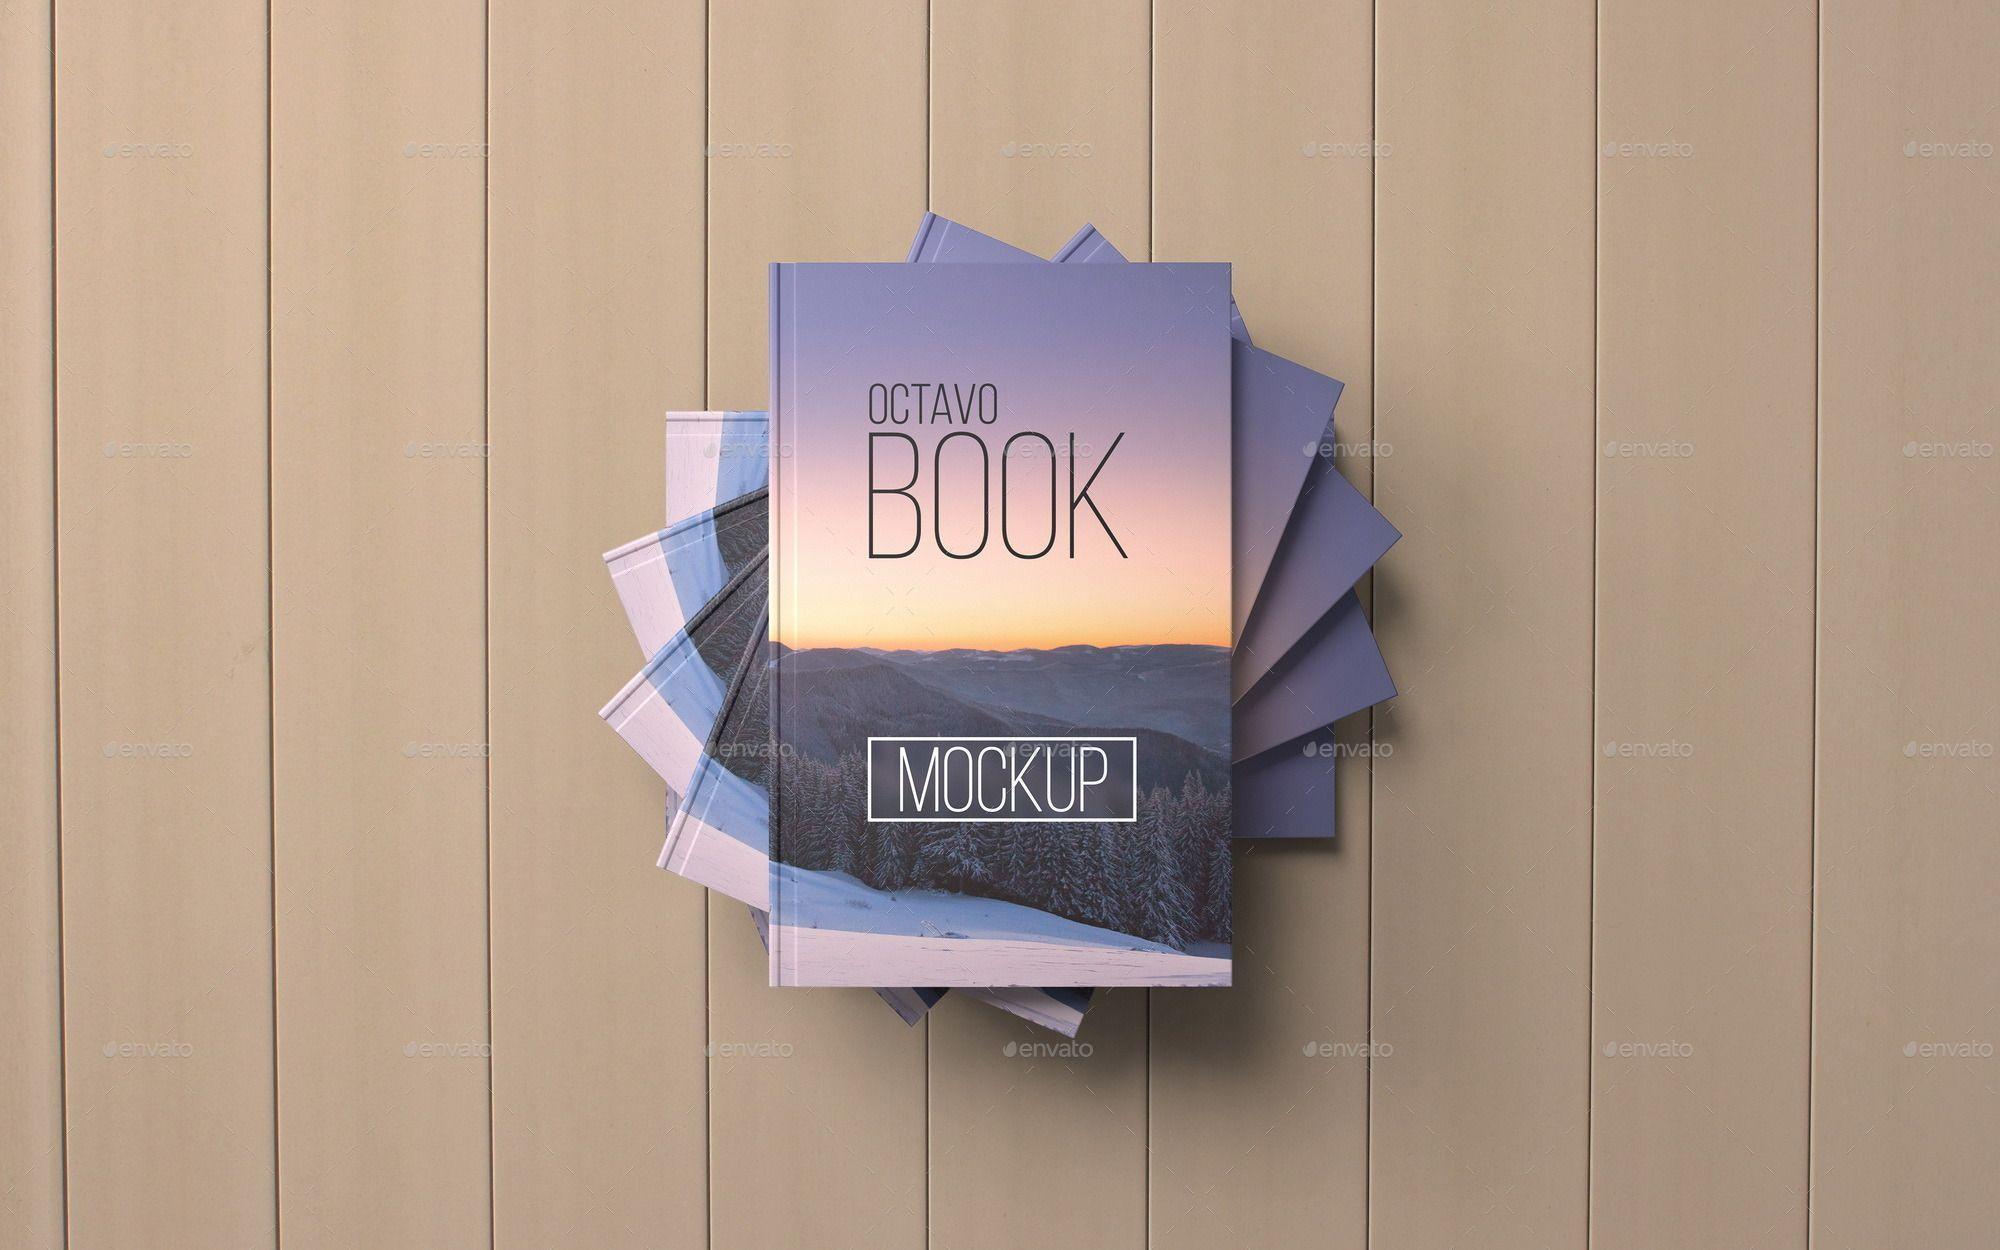 Octavo Book MockUp Set.1 Cover design, Vector pattern